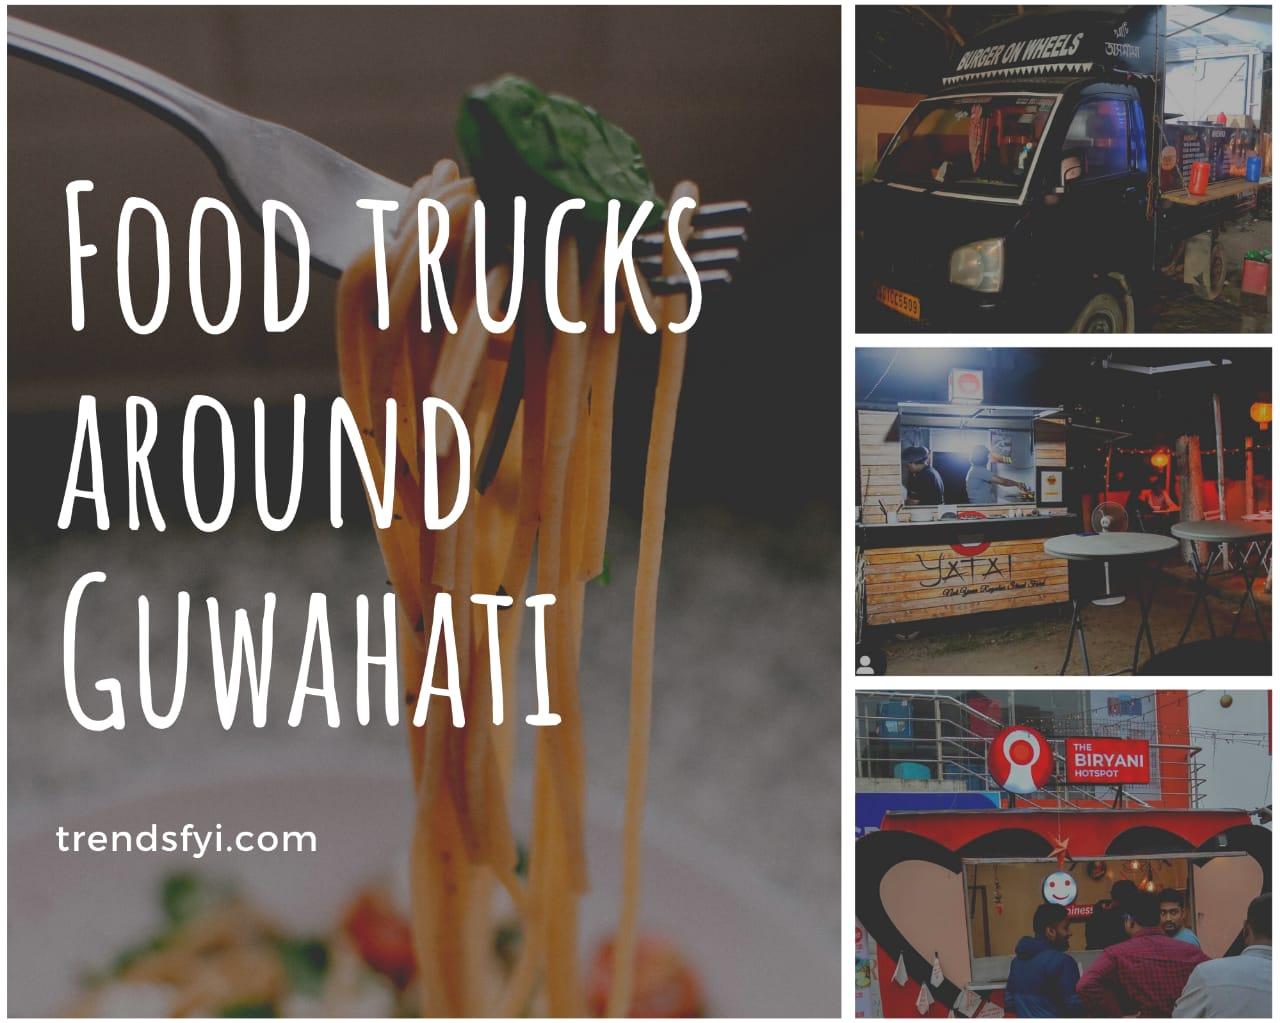 Food trucks in Guwahati